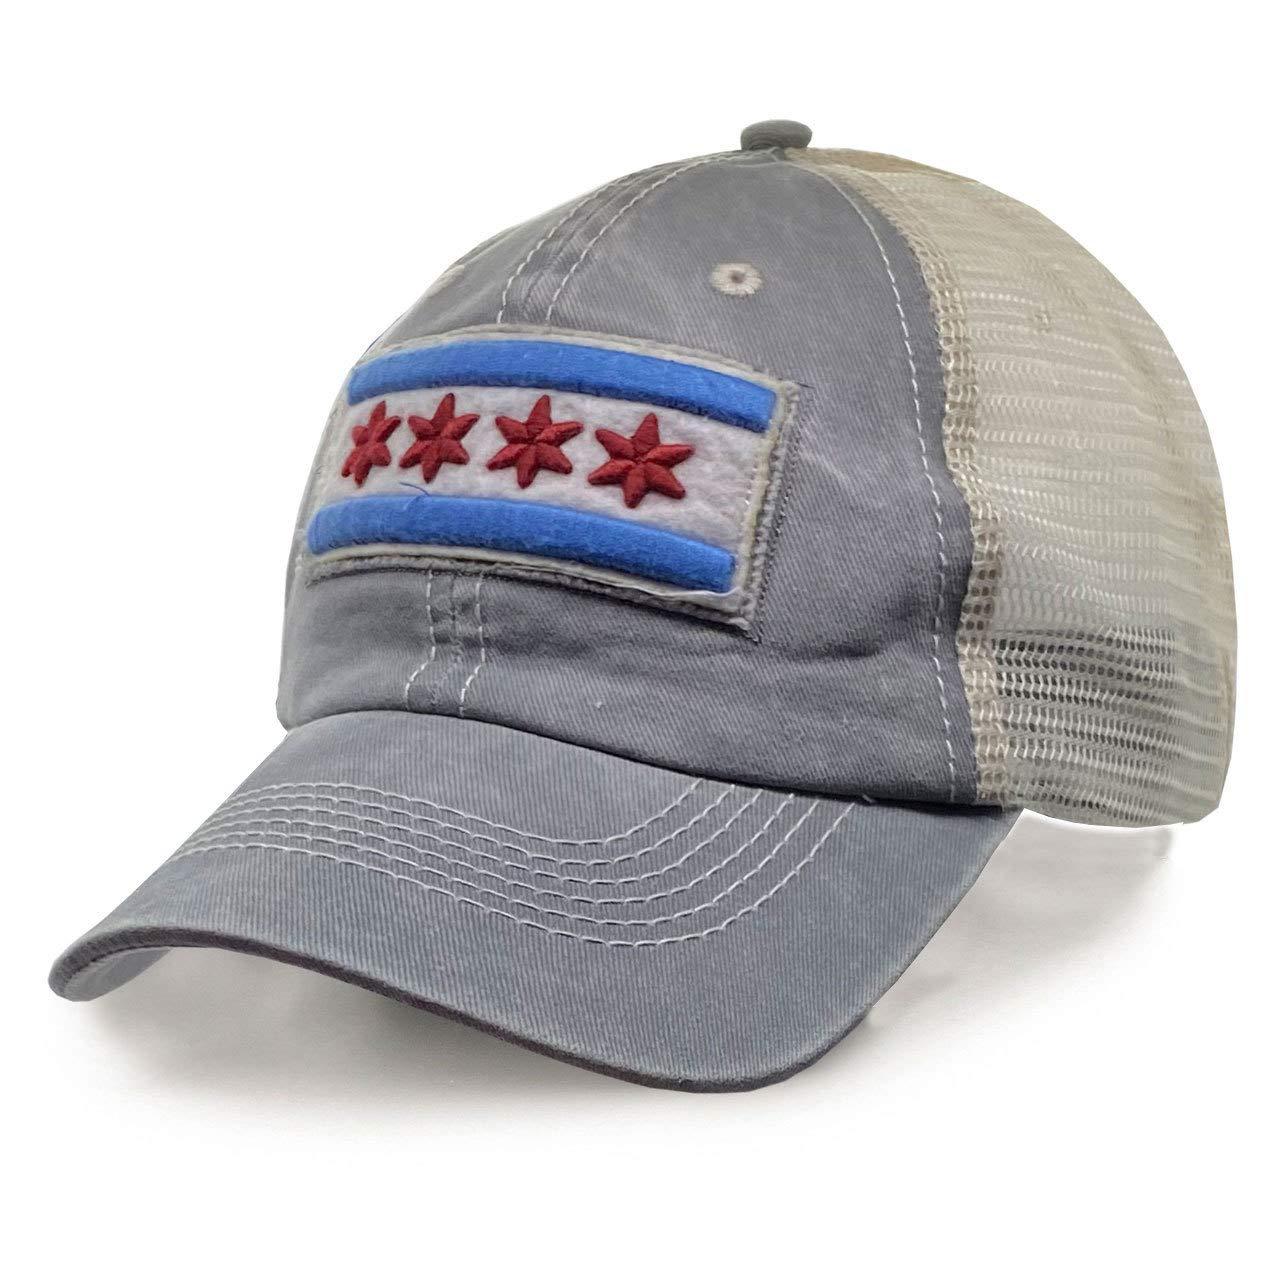 ThirtyFive55 City of Chicago Vintage Mesh Adjustable Flag Hat Gray